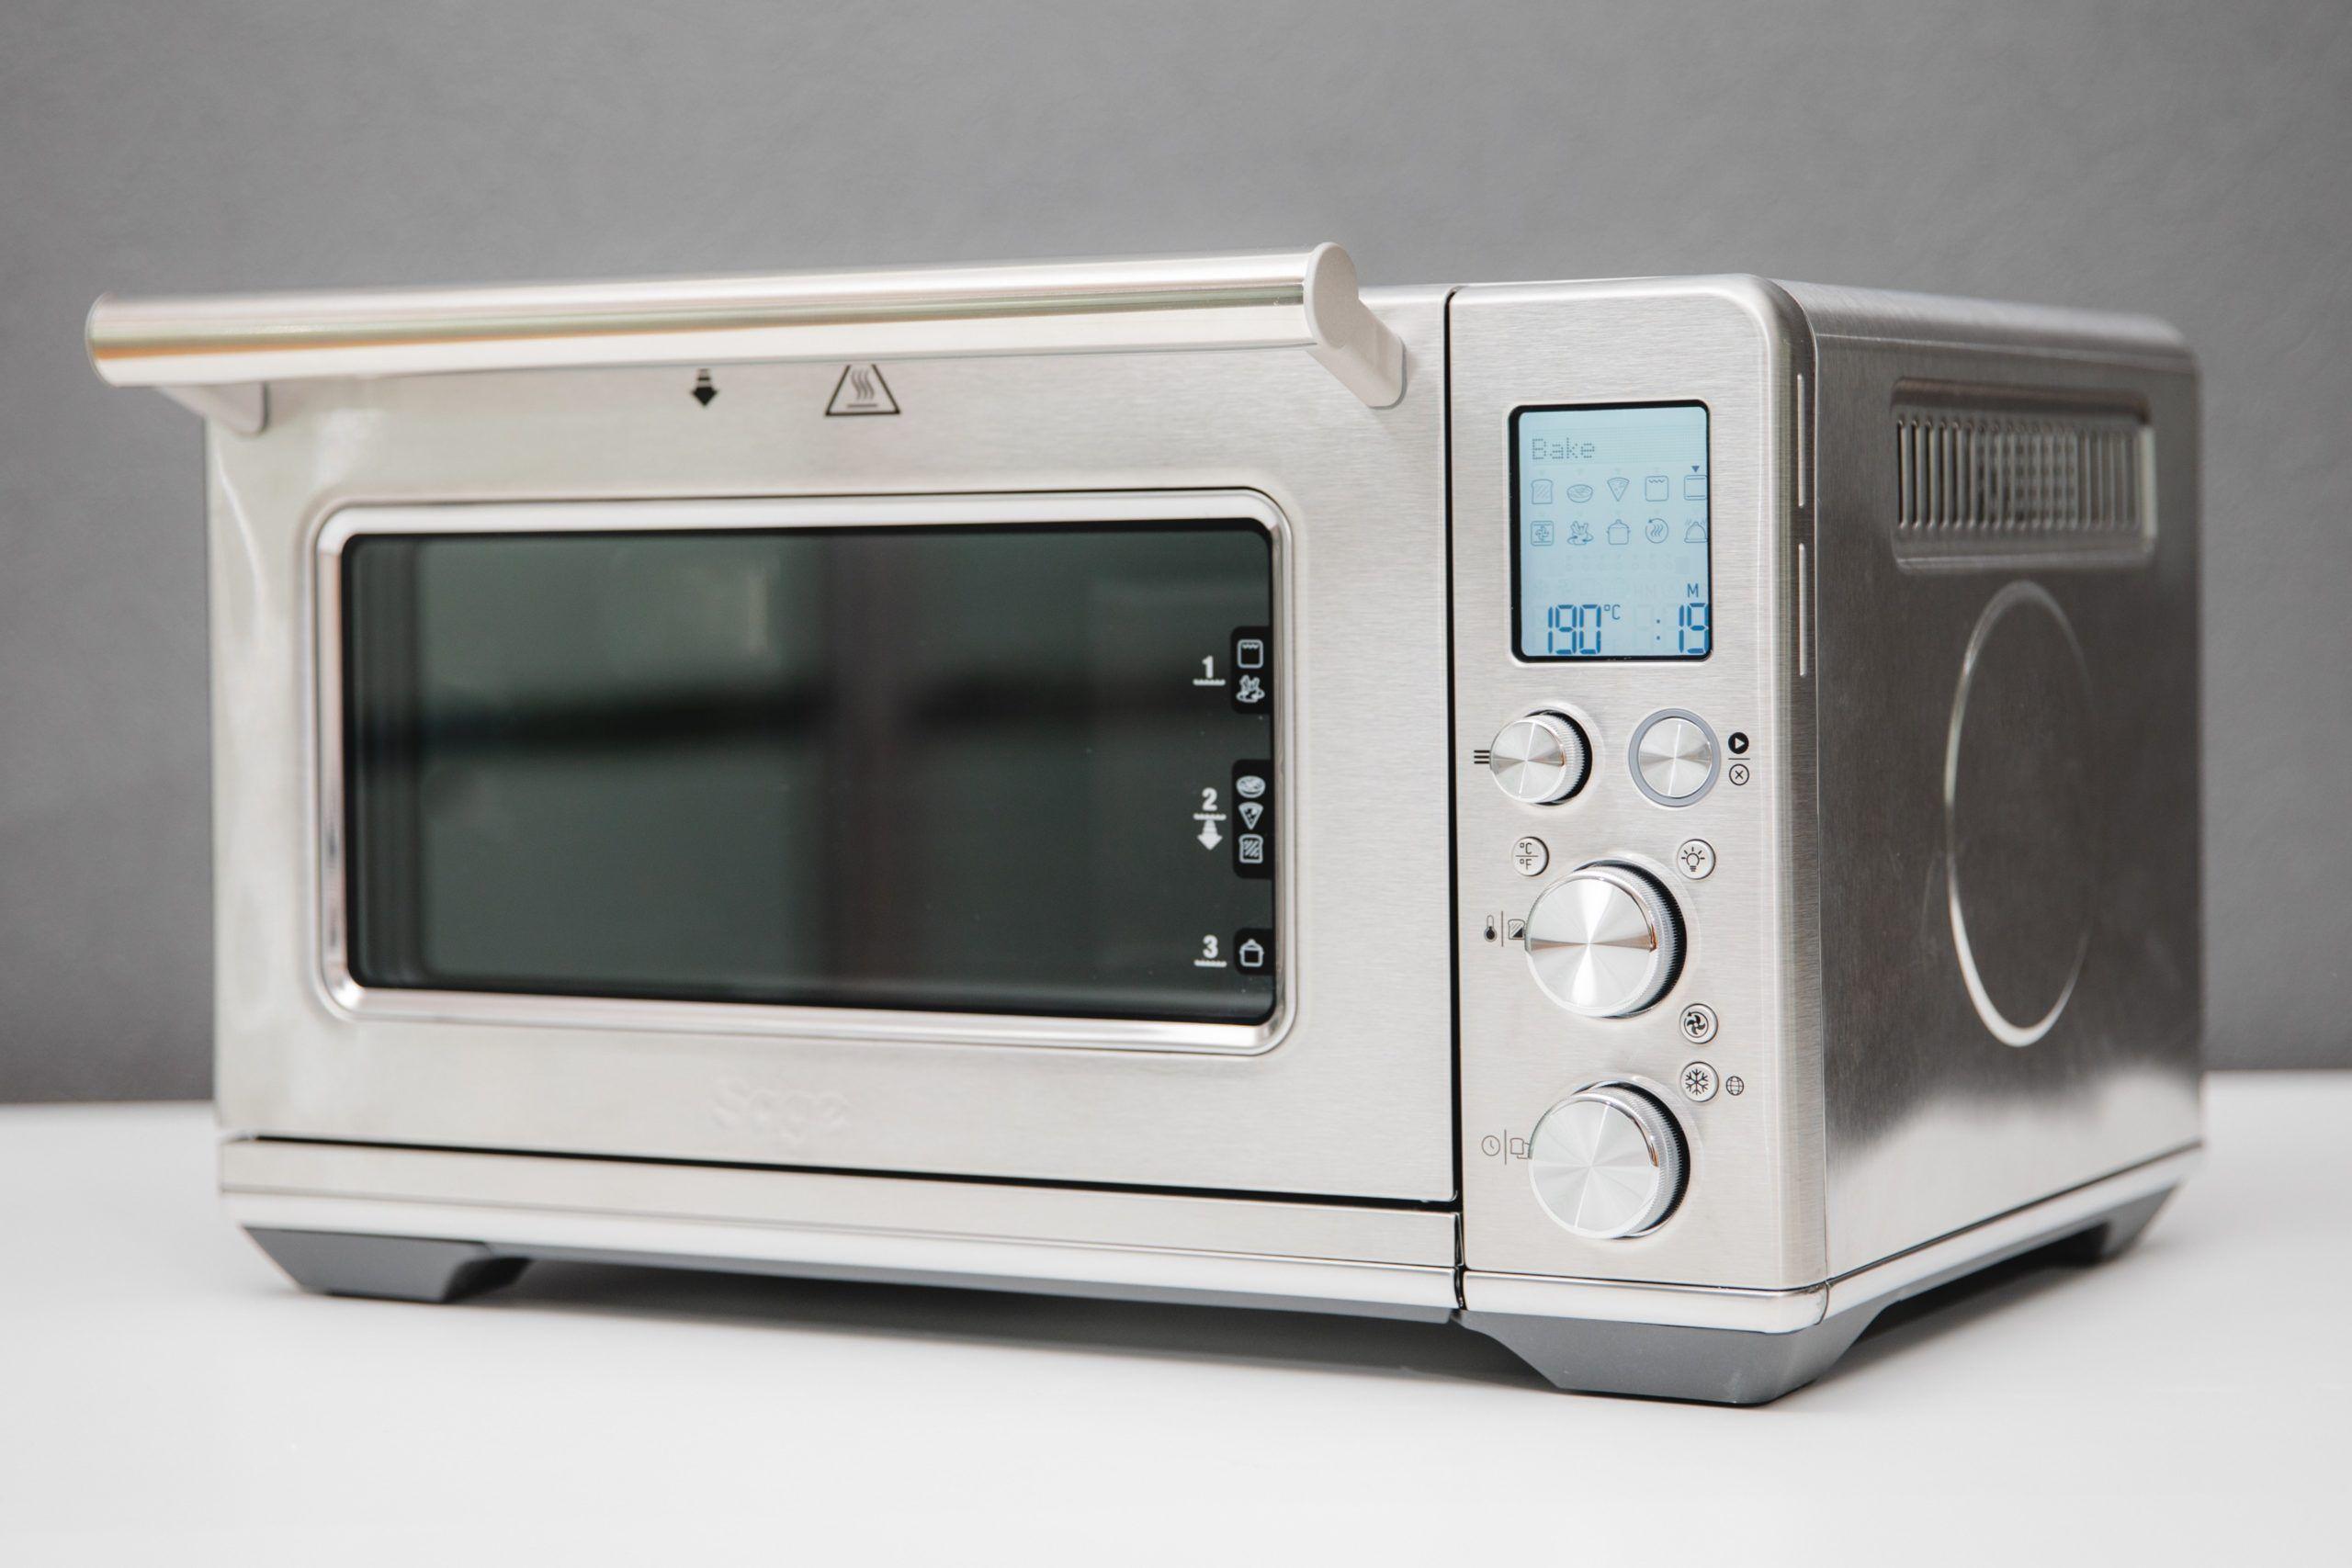 Air Fryer Sage Smart oven